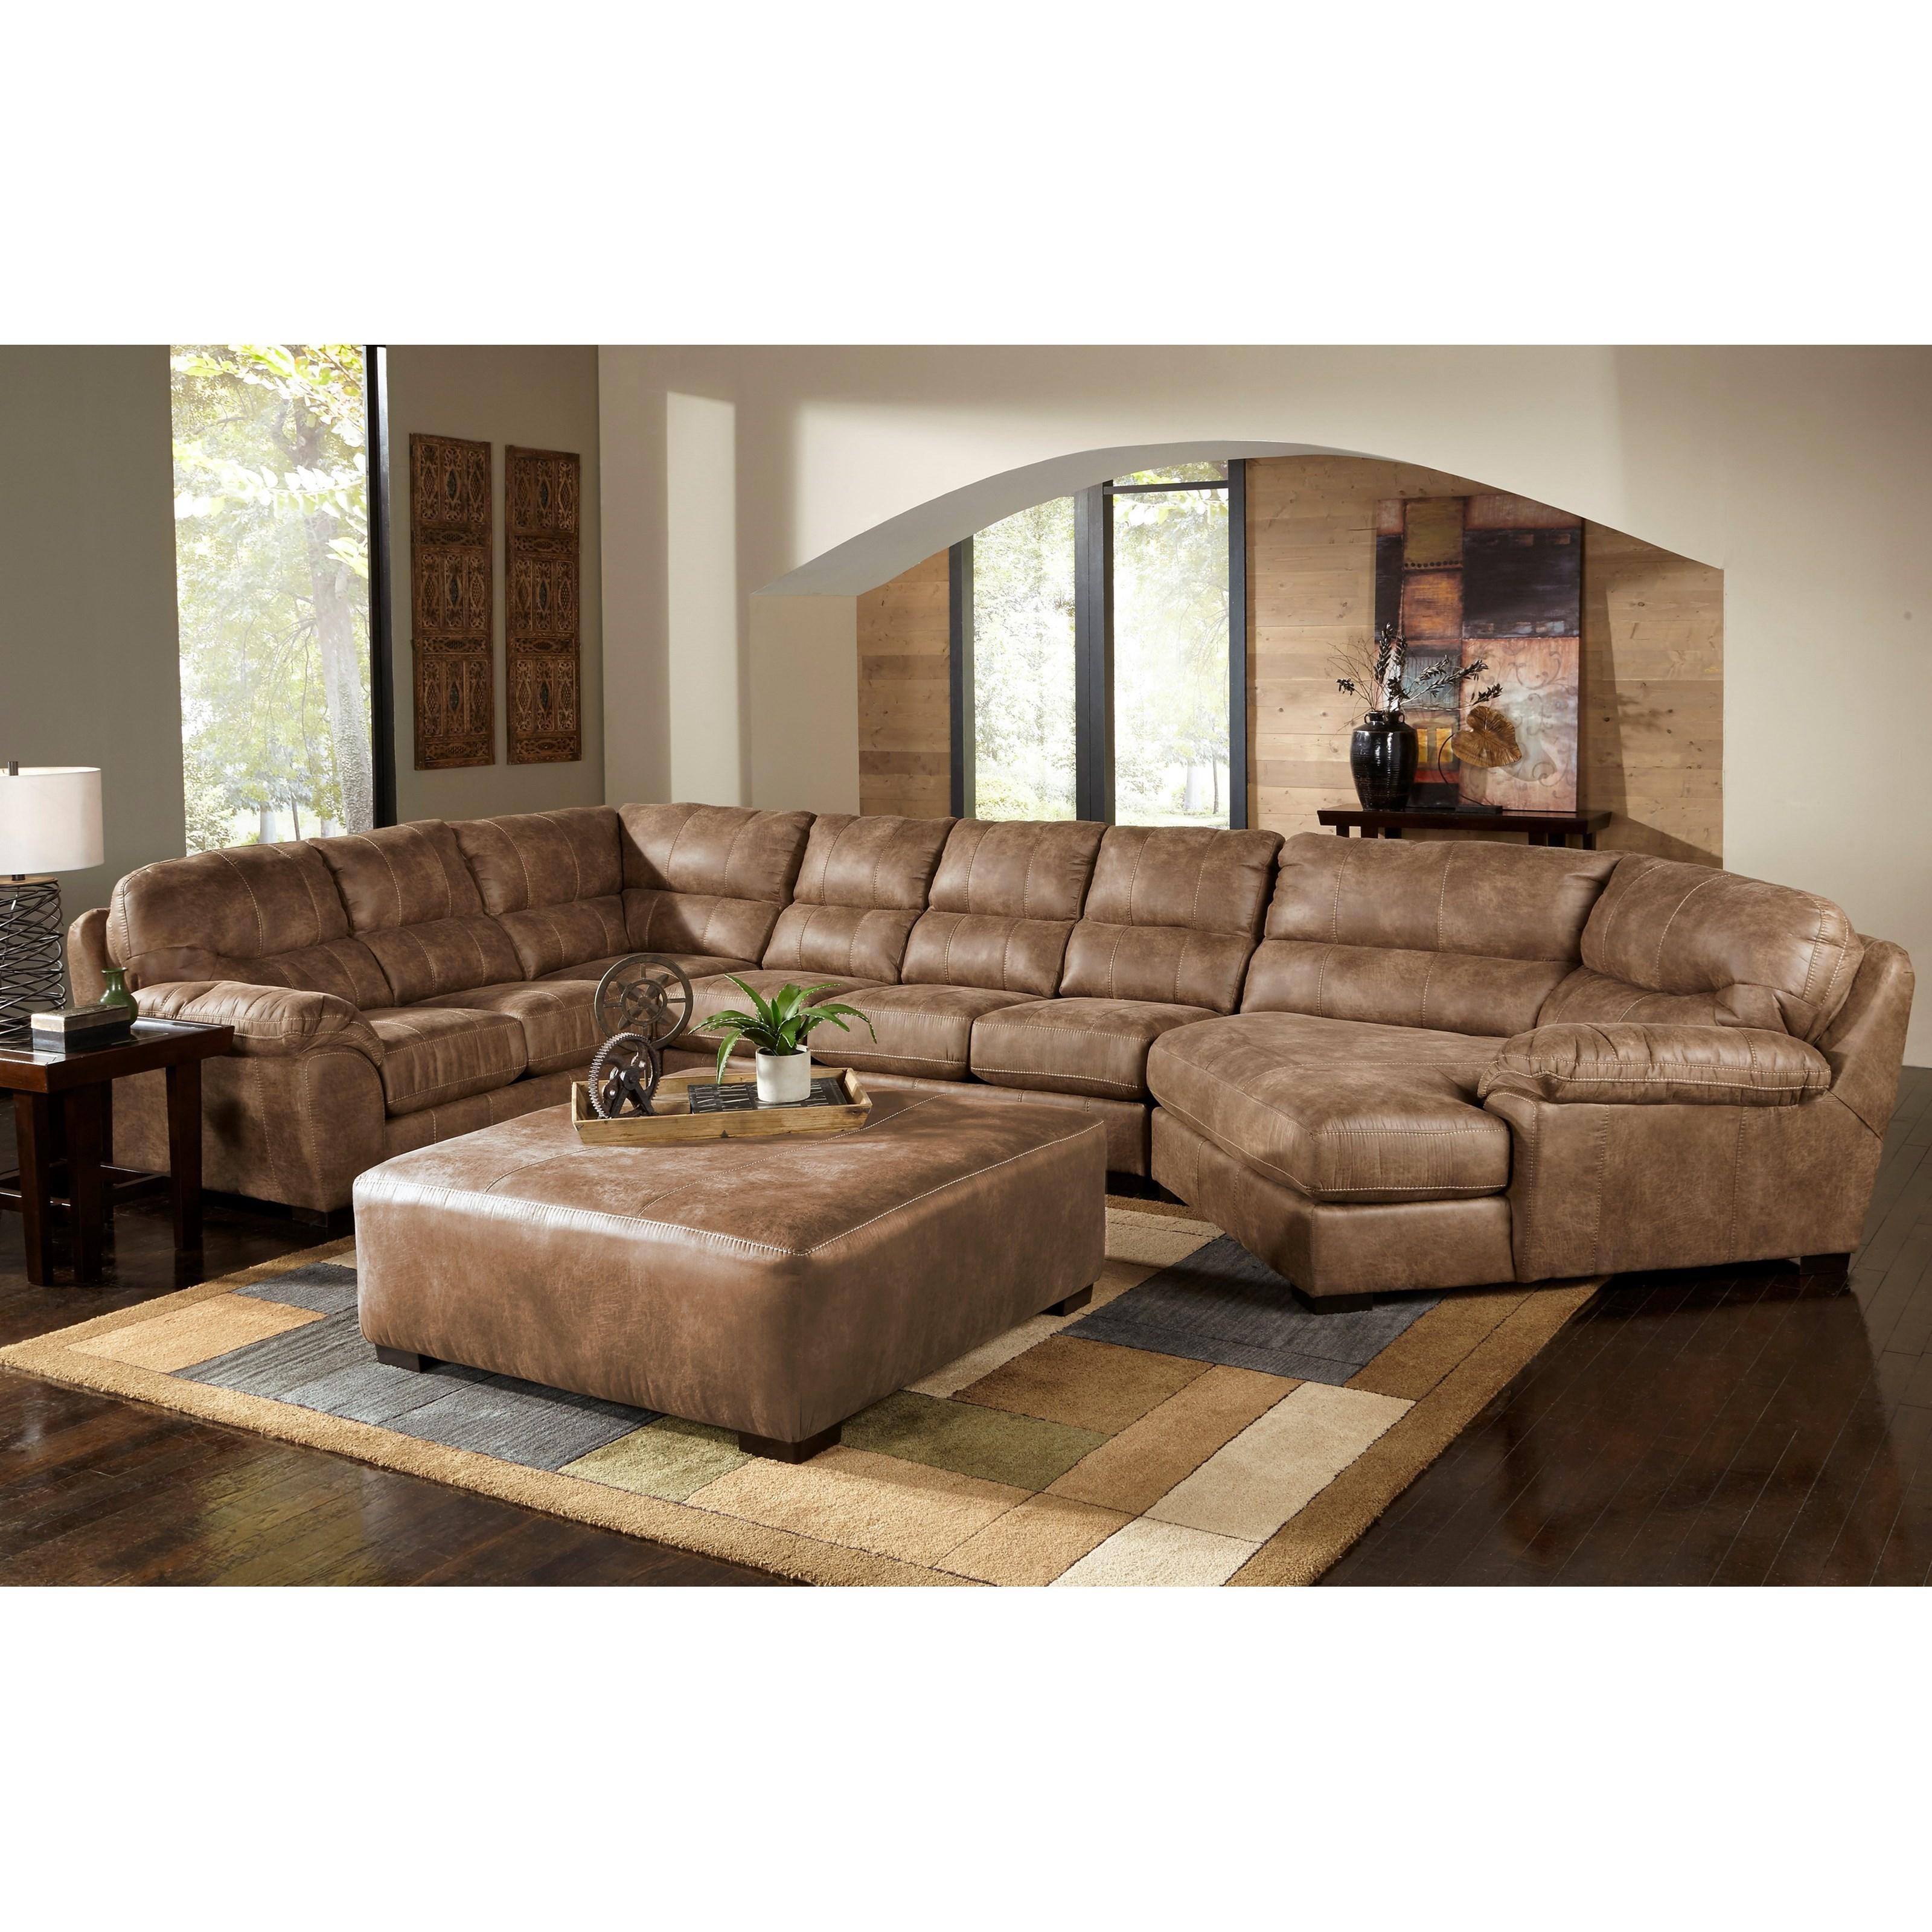 Great Jackson Furniture Jordan Sectional Sofa